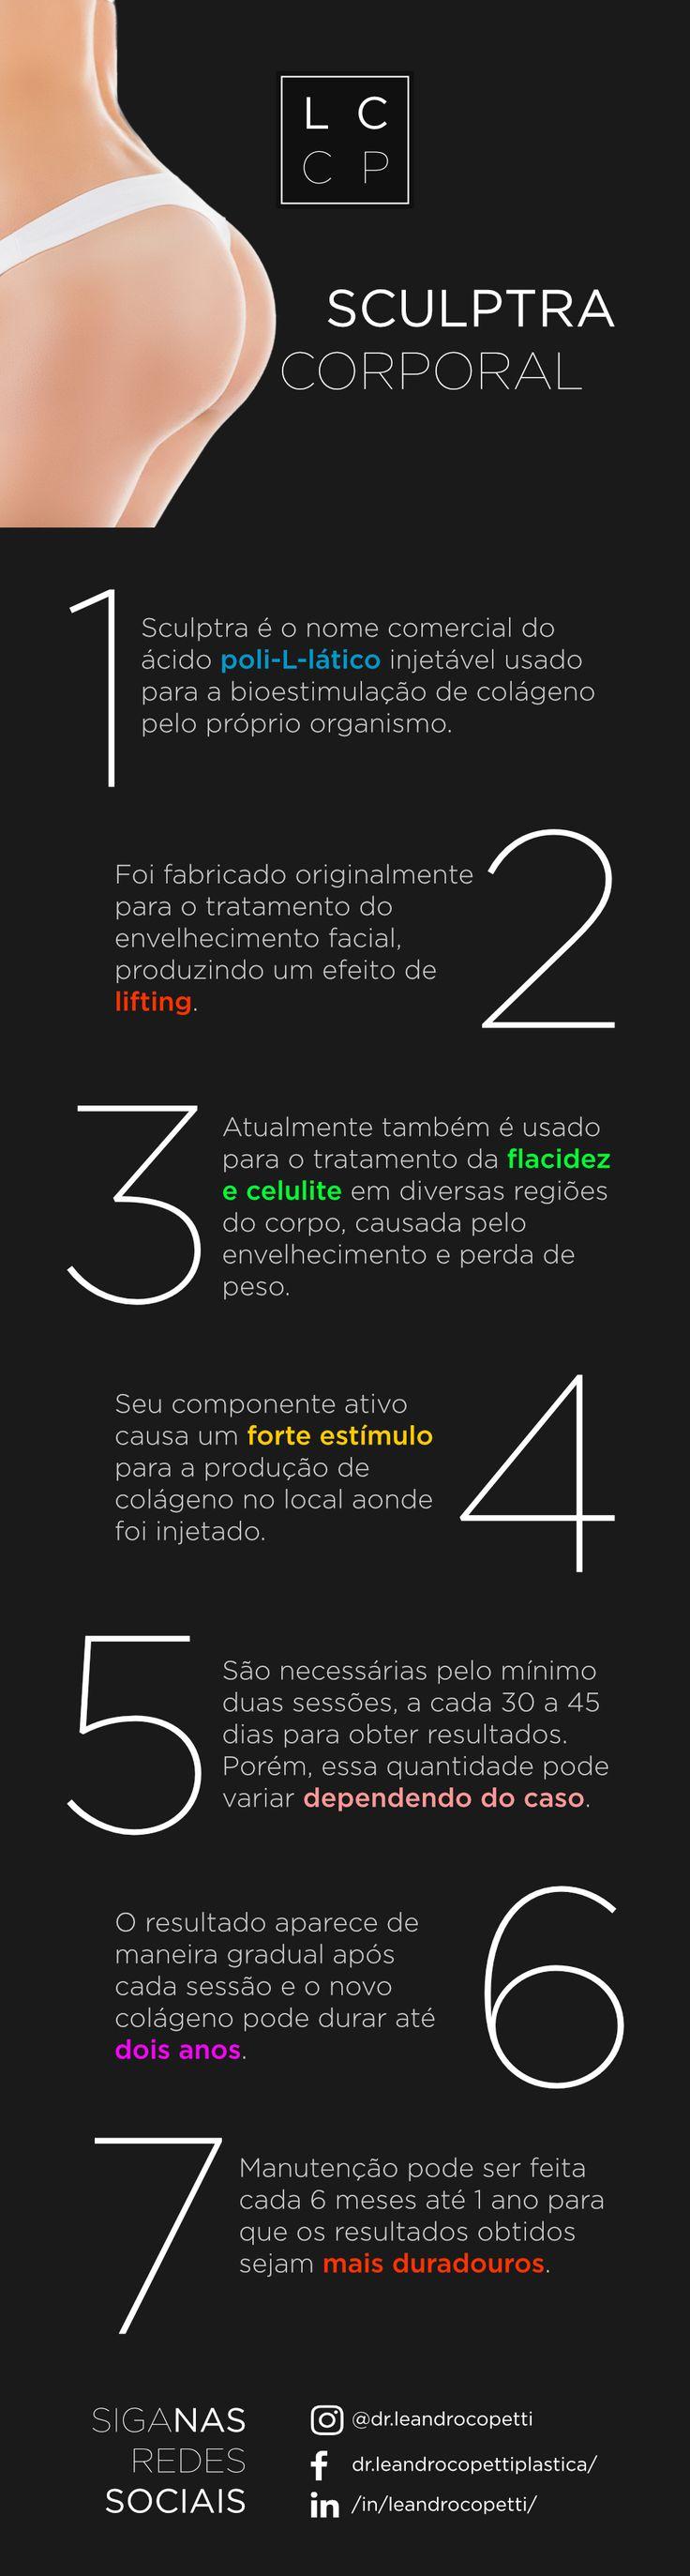 7 Curiosidades sobre o tratamento para flacidez e celulite corporal com ácido poli-L-lático (Sculptra®). Cirurgia Plástica e beleza. #celulite #bumbumempinado #sculptra #gluteos